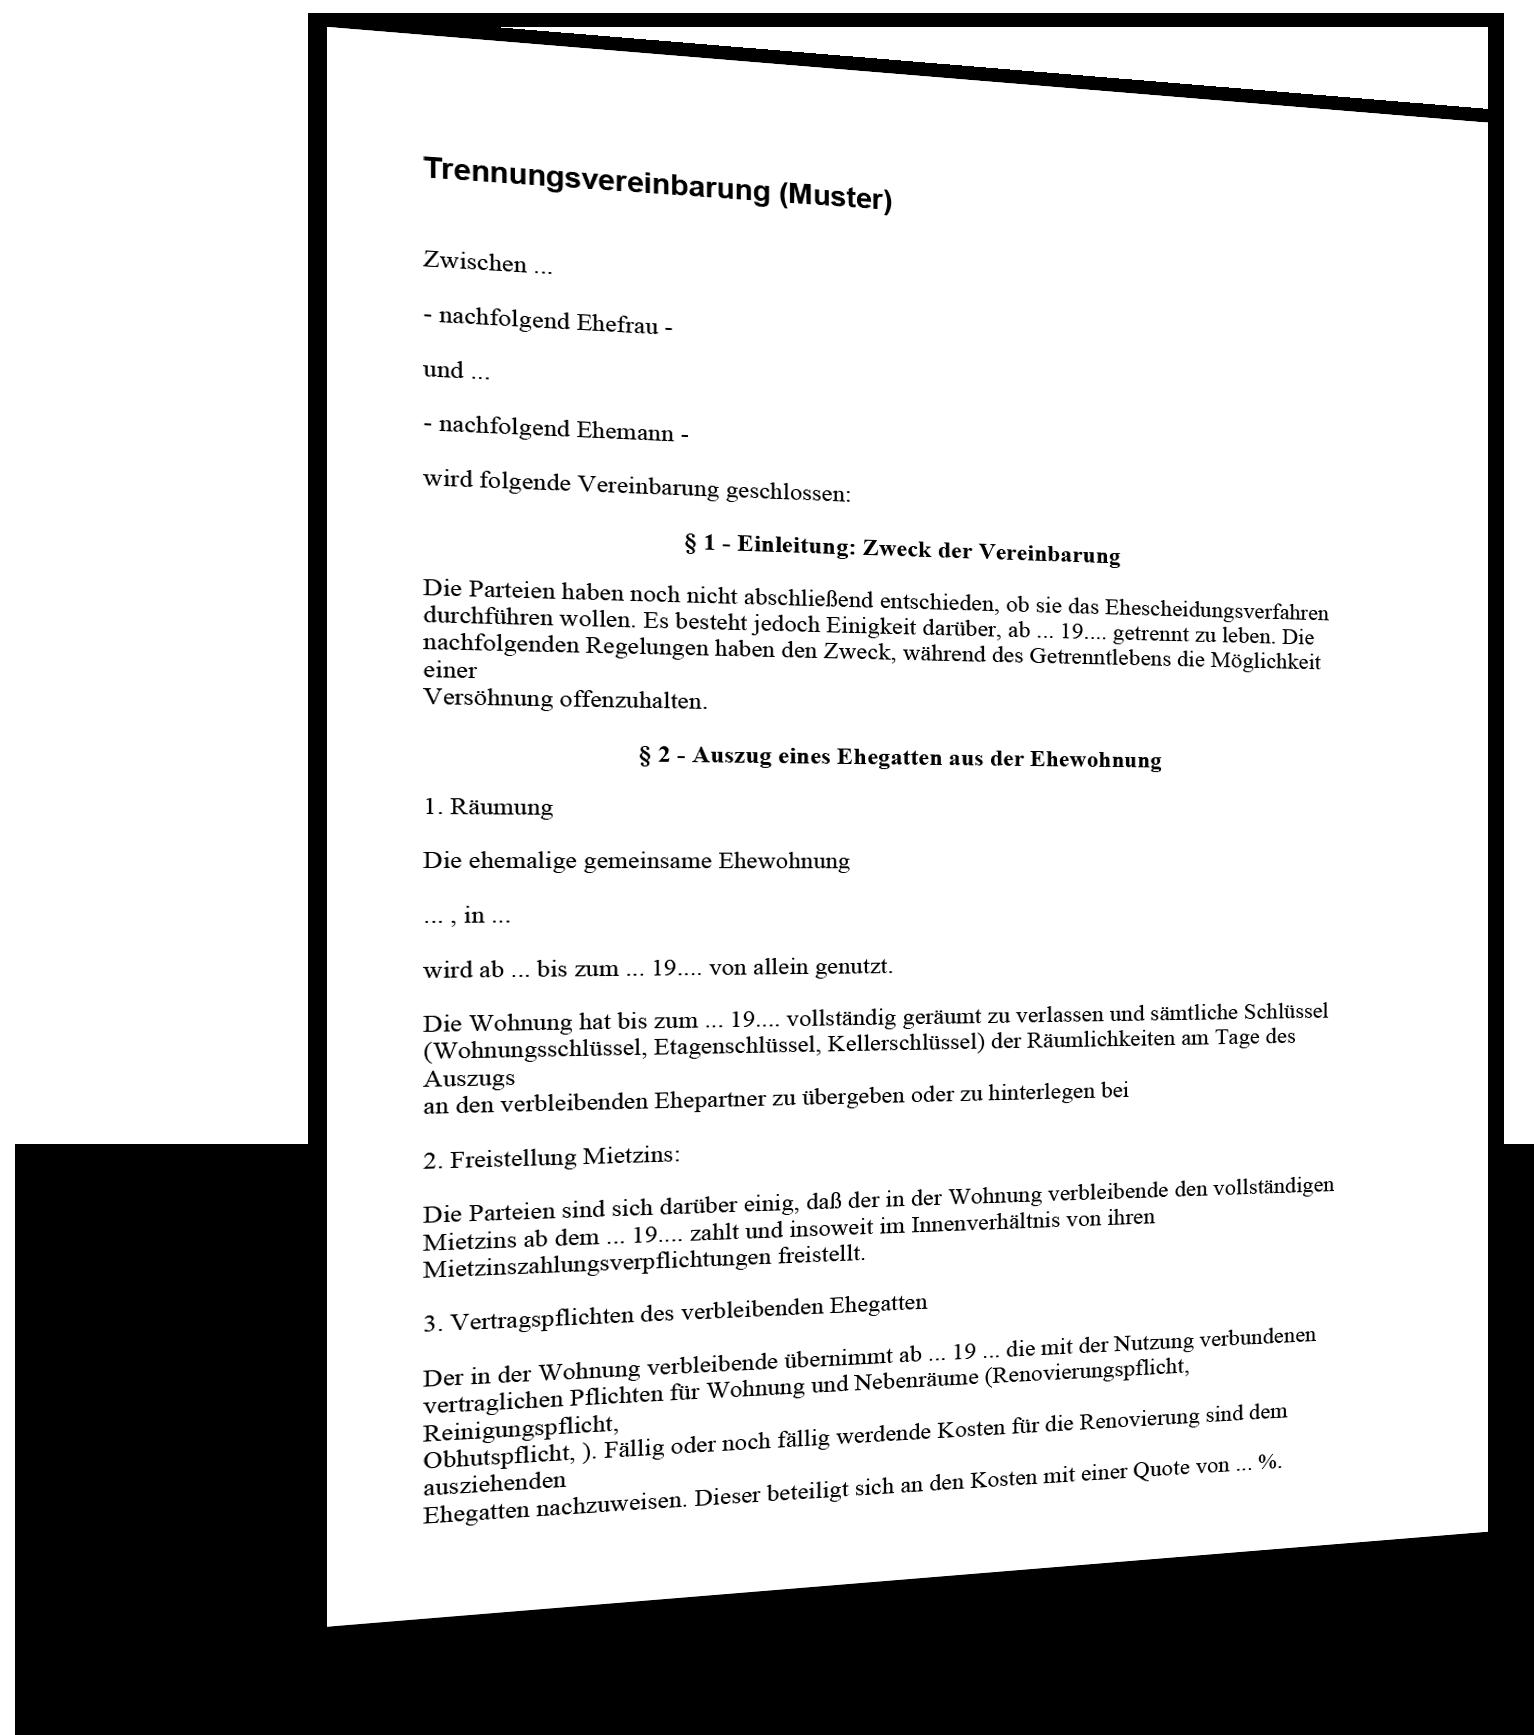 Trennungsvereinbarung Muster Standardvertraege De